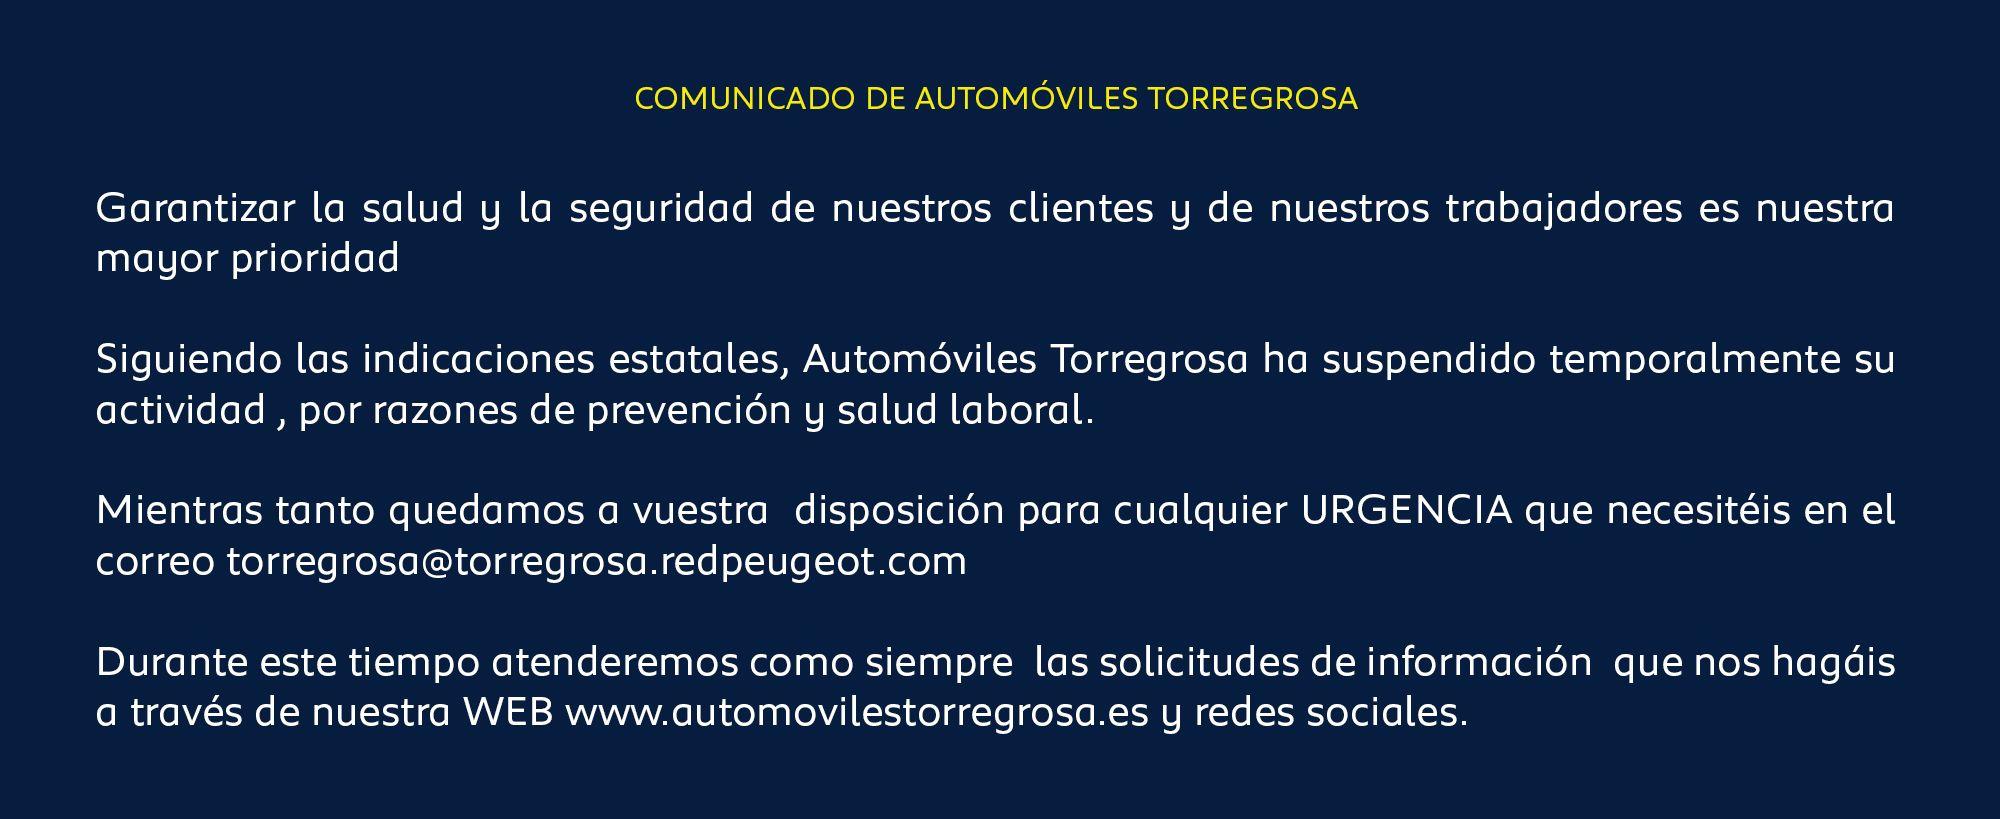 COMUNICADO DE AUTOMÓVILES TORREGROSA